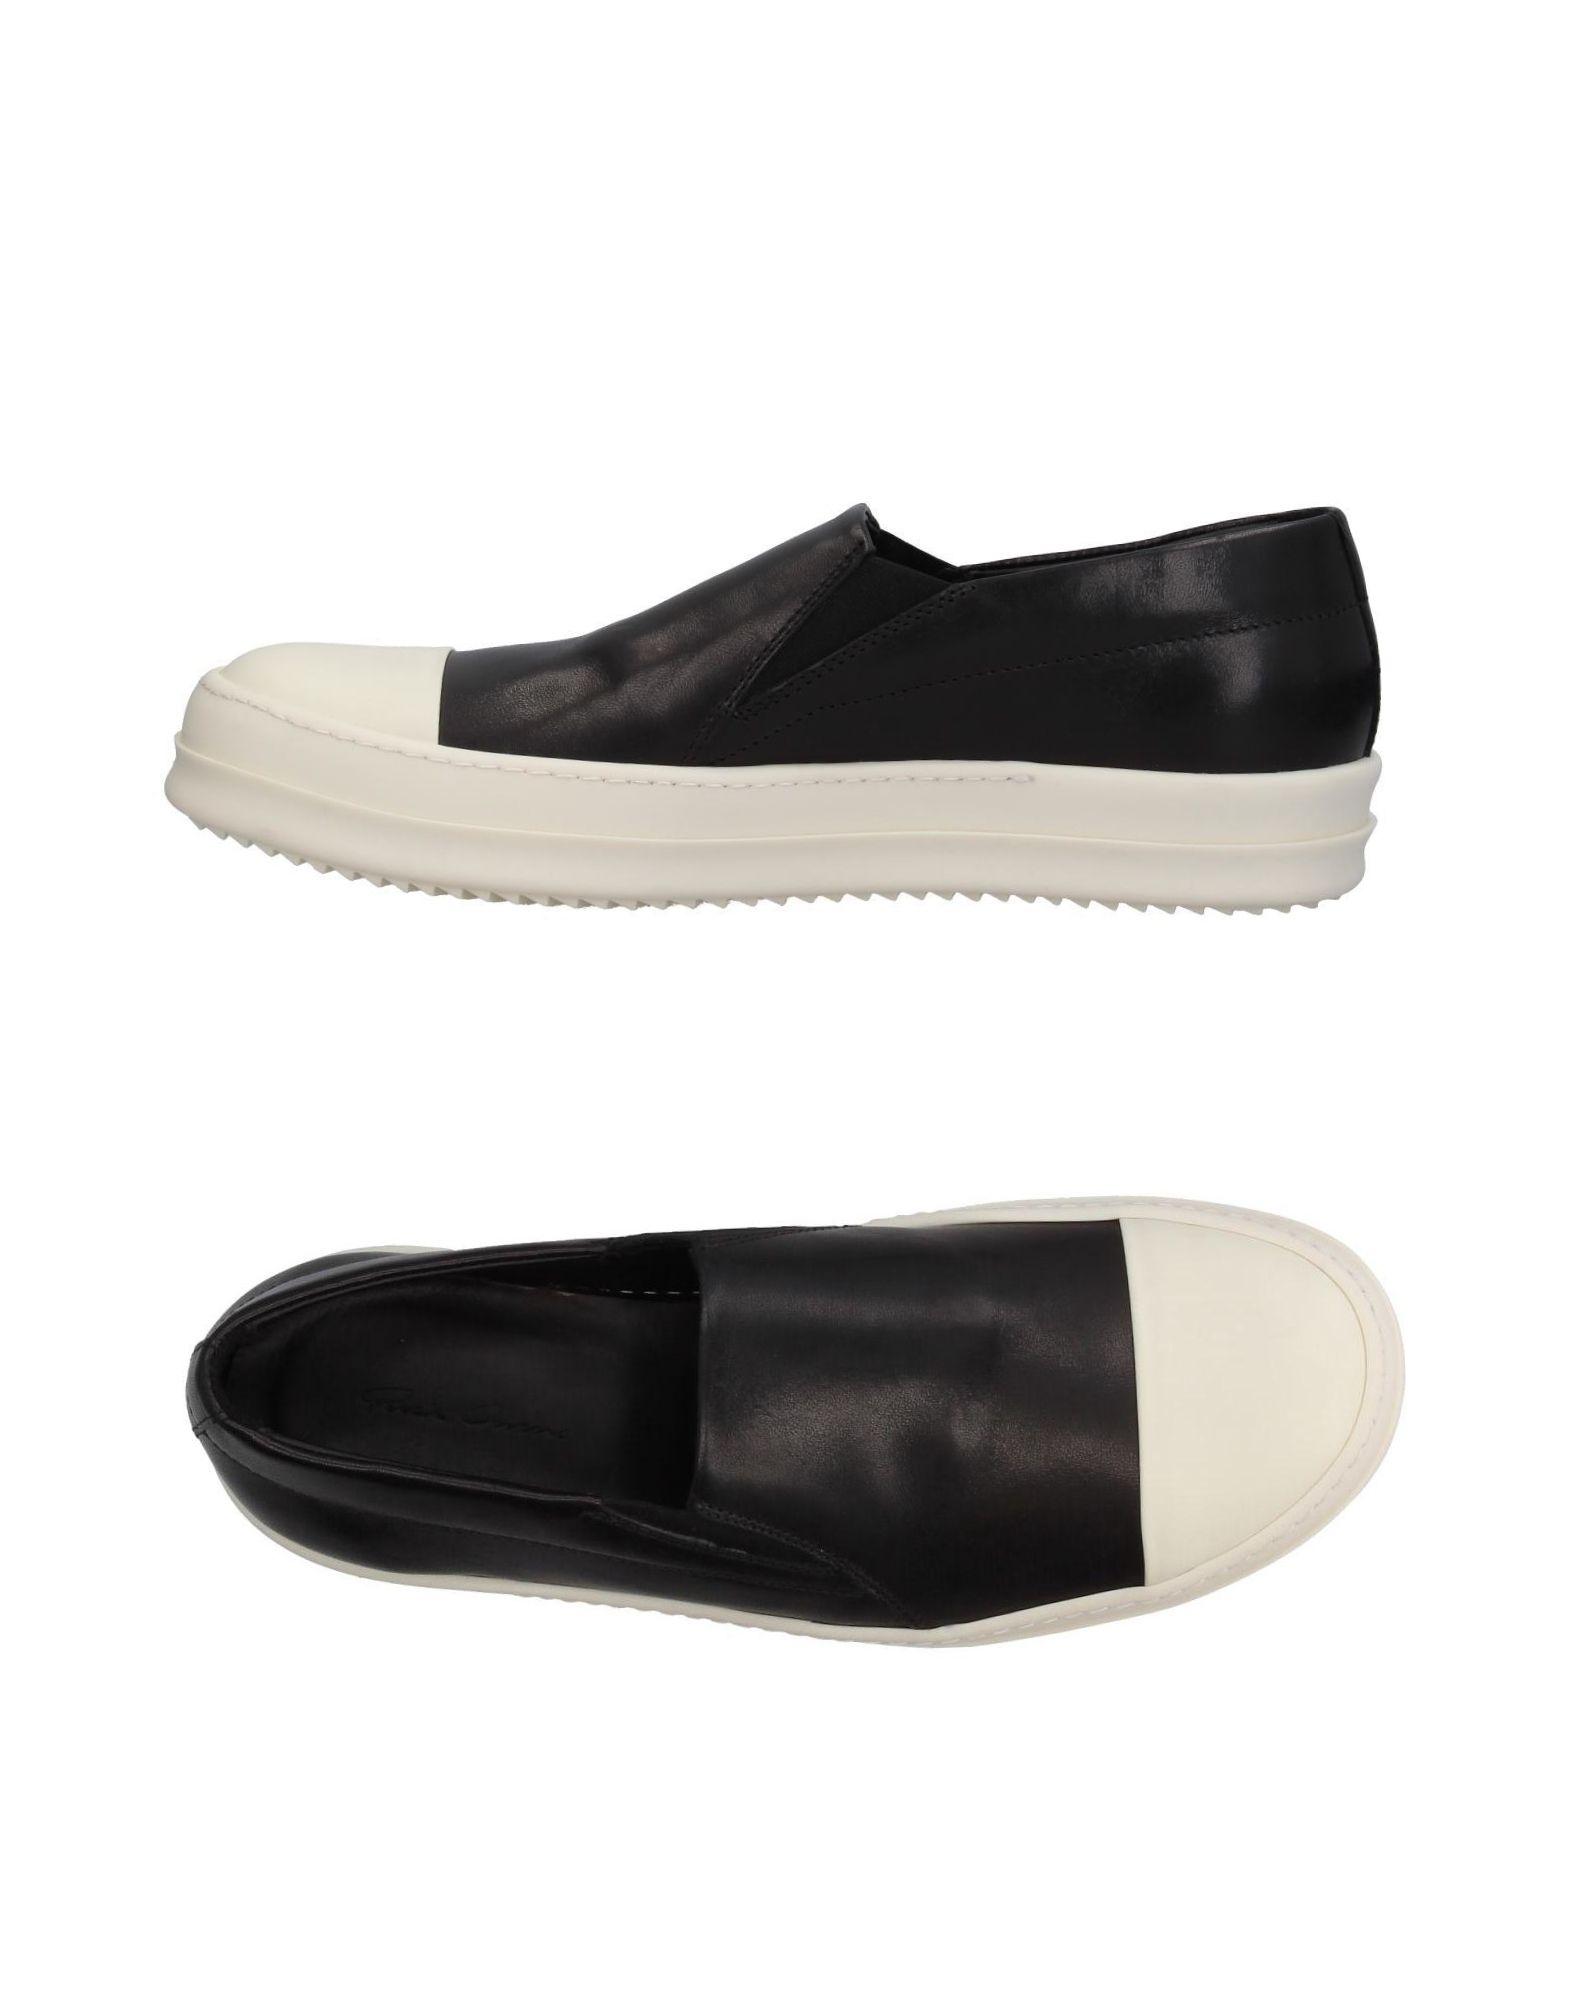 Rick Owens Sneakers Herren  11398572FJ Gute Qualität beliebte Schuhe